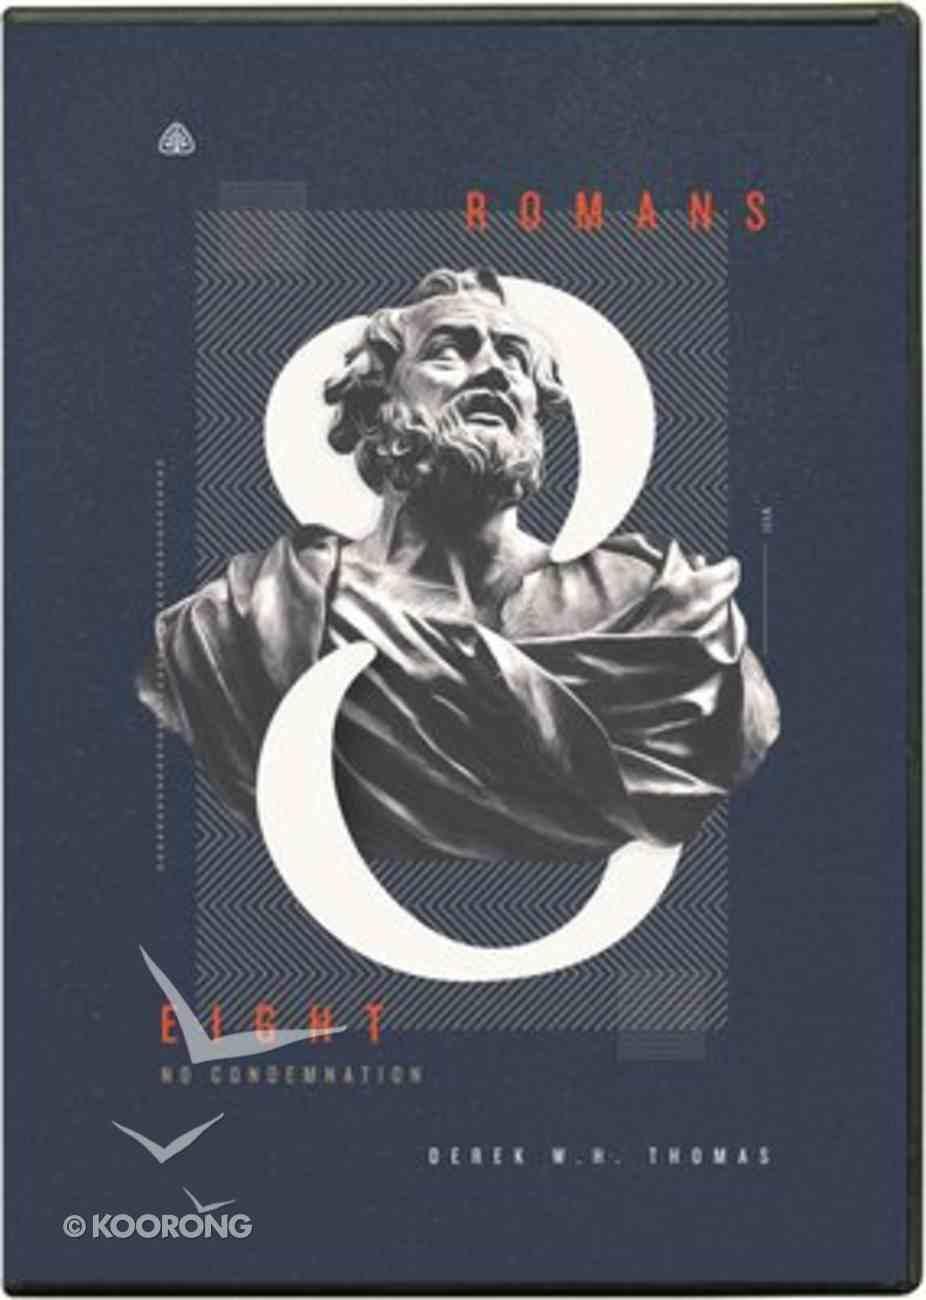 Romans Eight: No Condemnation (Twelve 23-Minute Messages on 2 Dvds) (Dvd) DVD